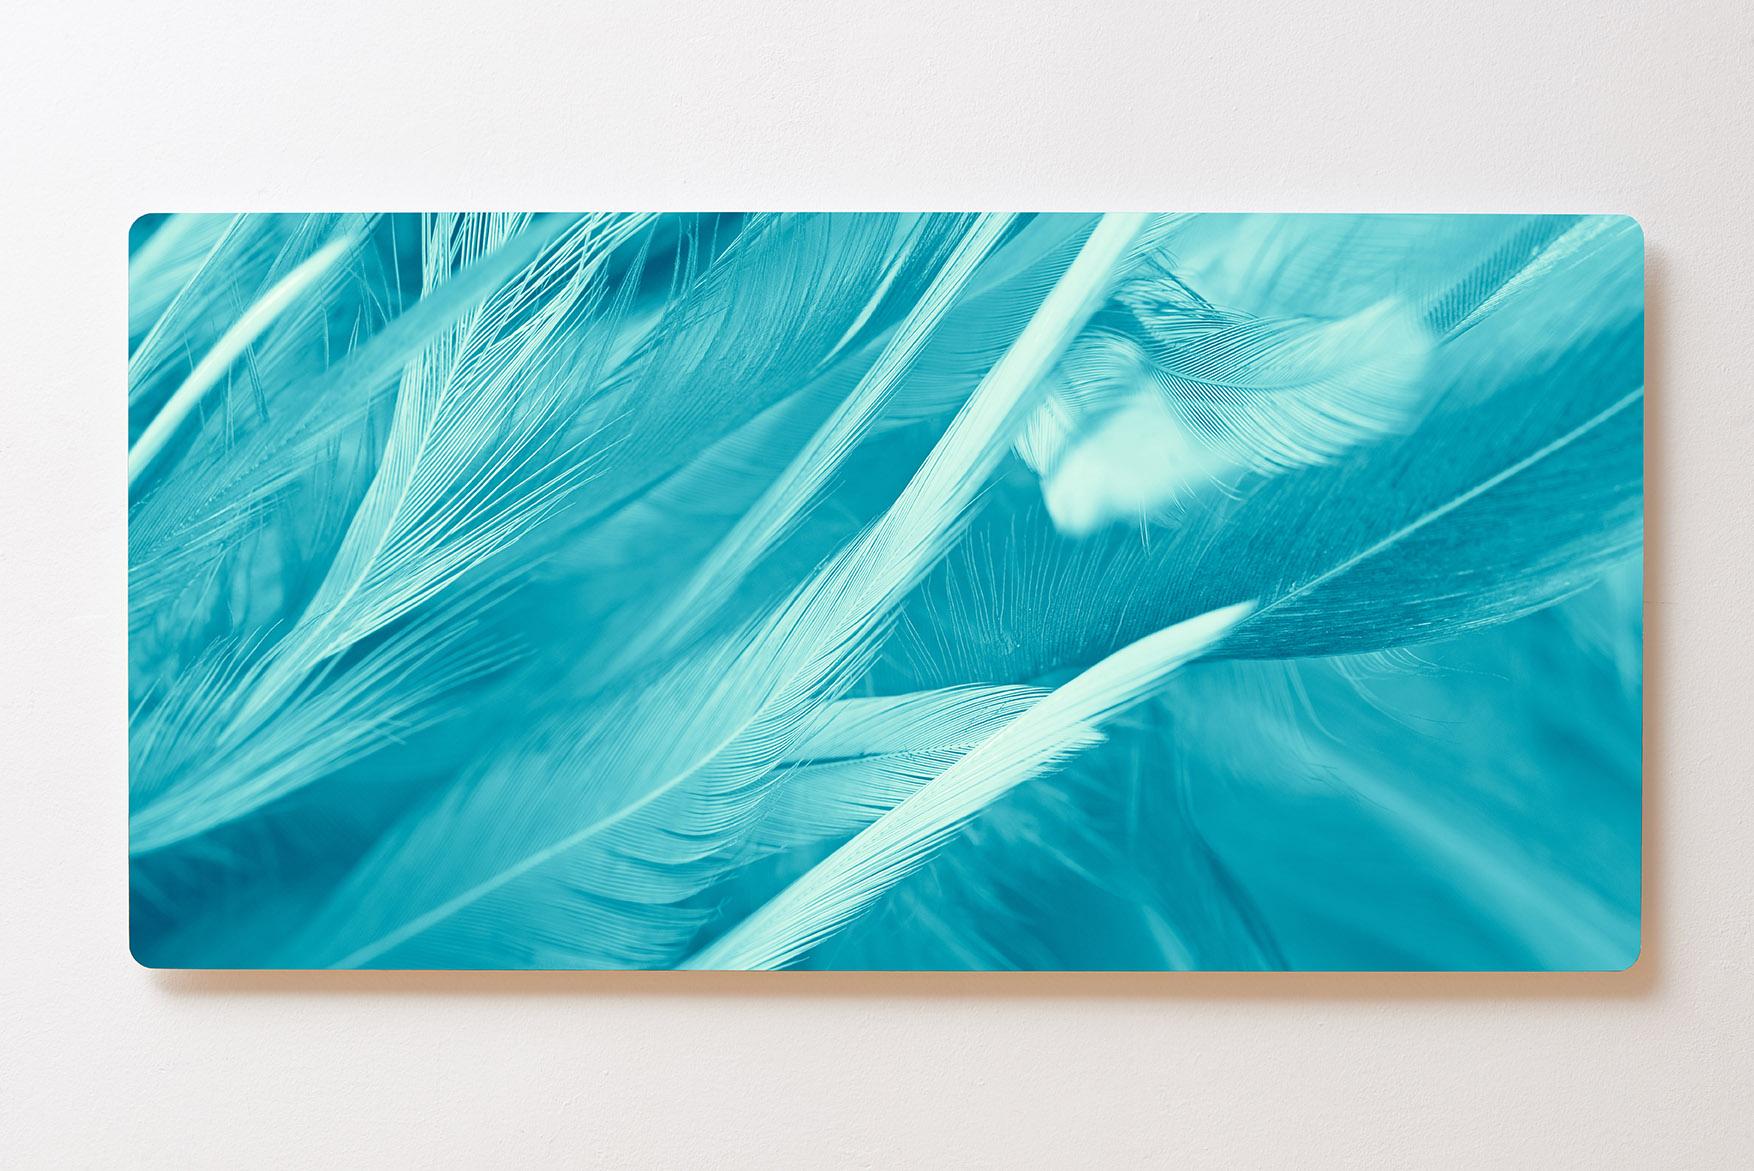 Magnettafel BACKLIGHT 120x60cm Motiv-Wandbild M136 Federn Kunst